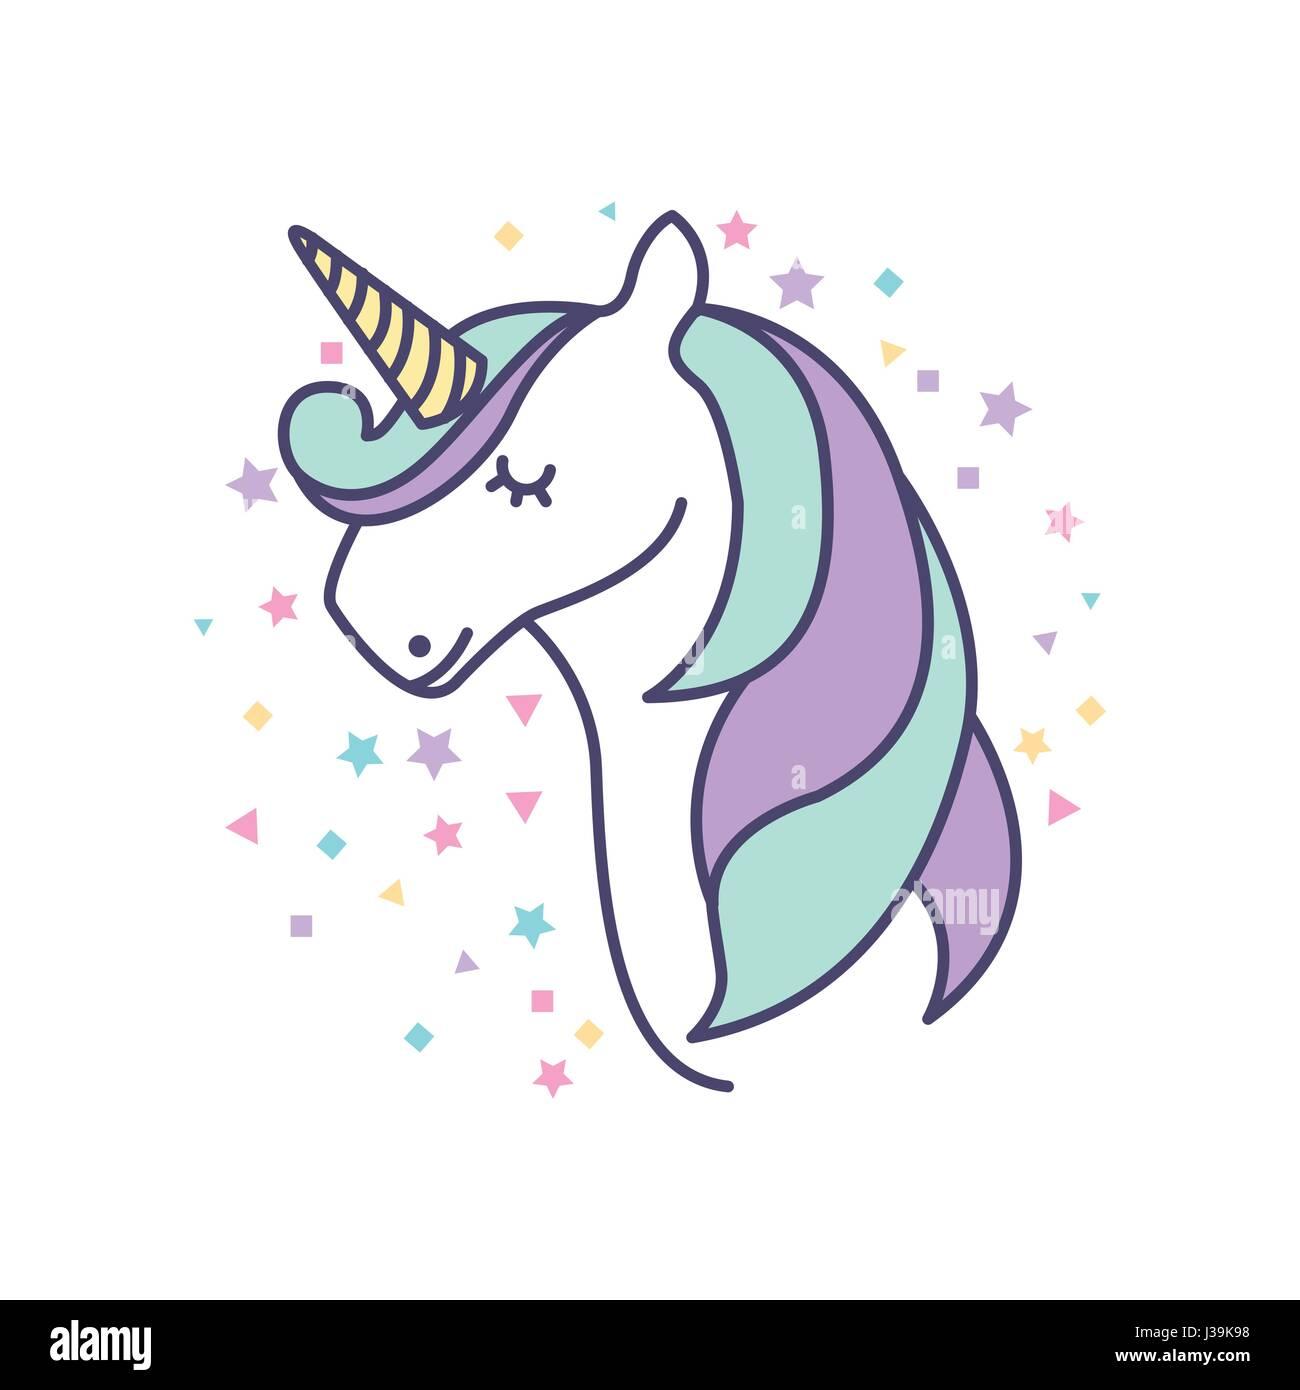 drawing cute unicorn icon stock vector art u0026 illustration vector